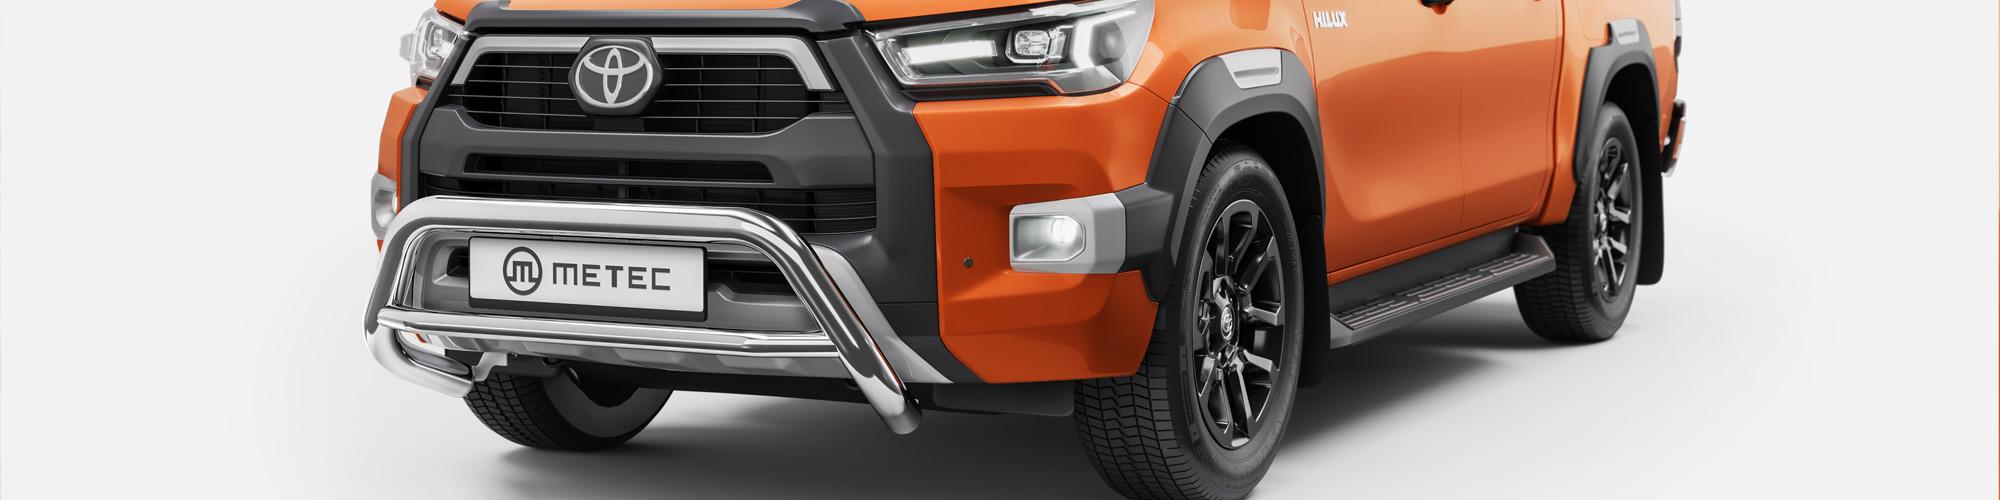 Frontbåge Toyota Hilux 2021+ bakgrundsbild